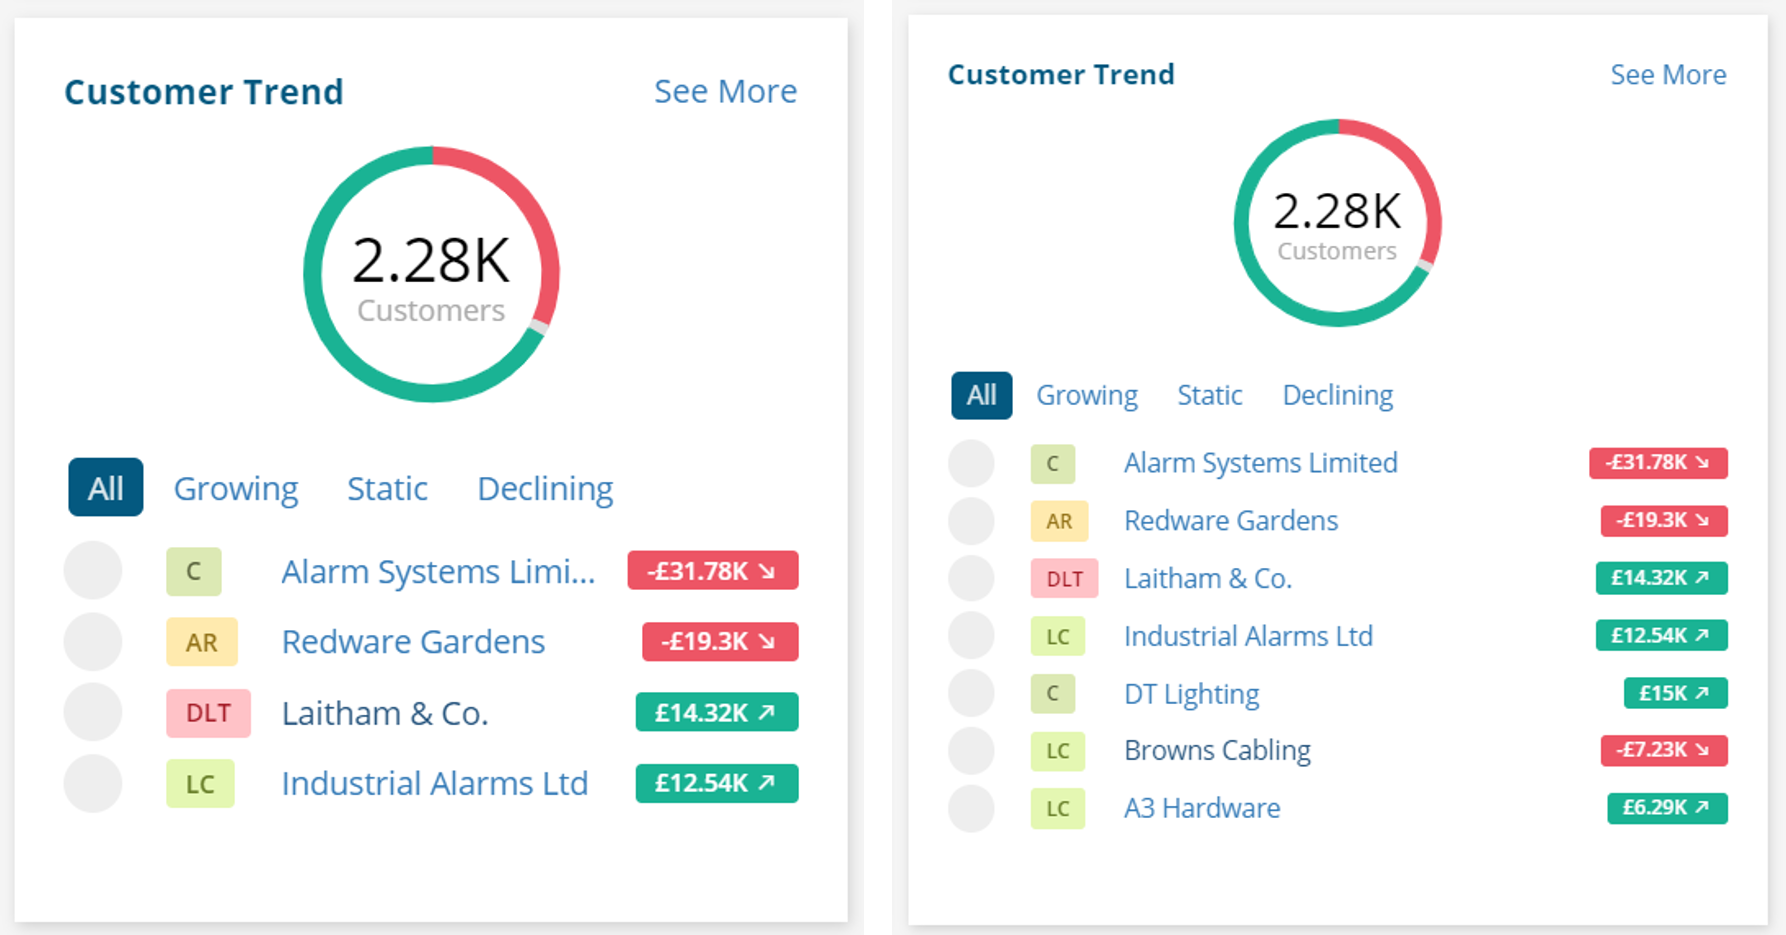 Customer Trend 100% zoom (left) vs. 75% zoom (right)